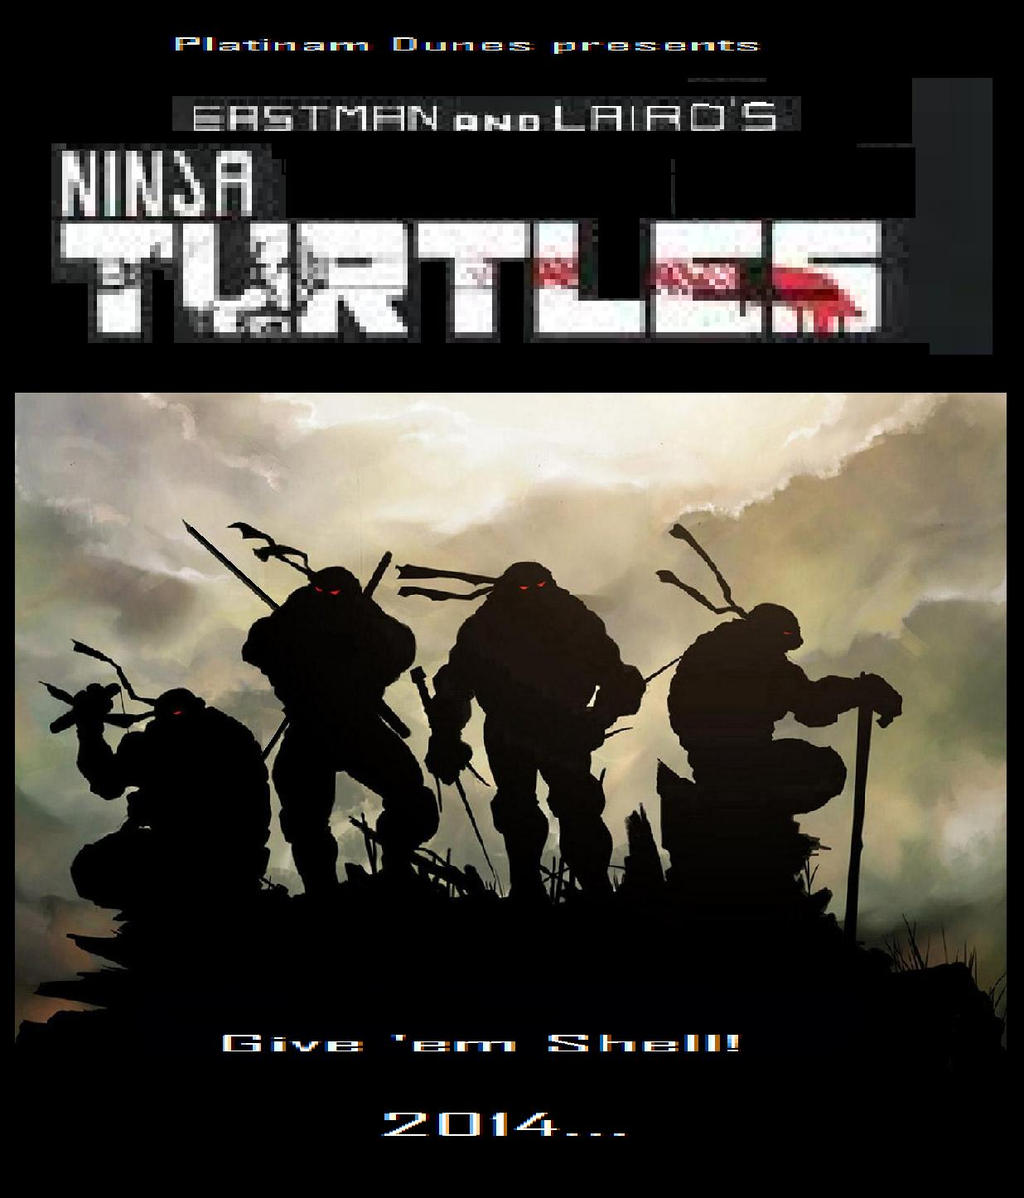 Ninja Turtles movie poster by NuvaPrime on DeviantArt